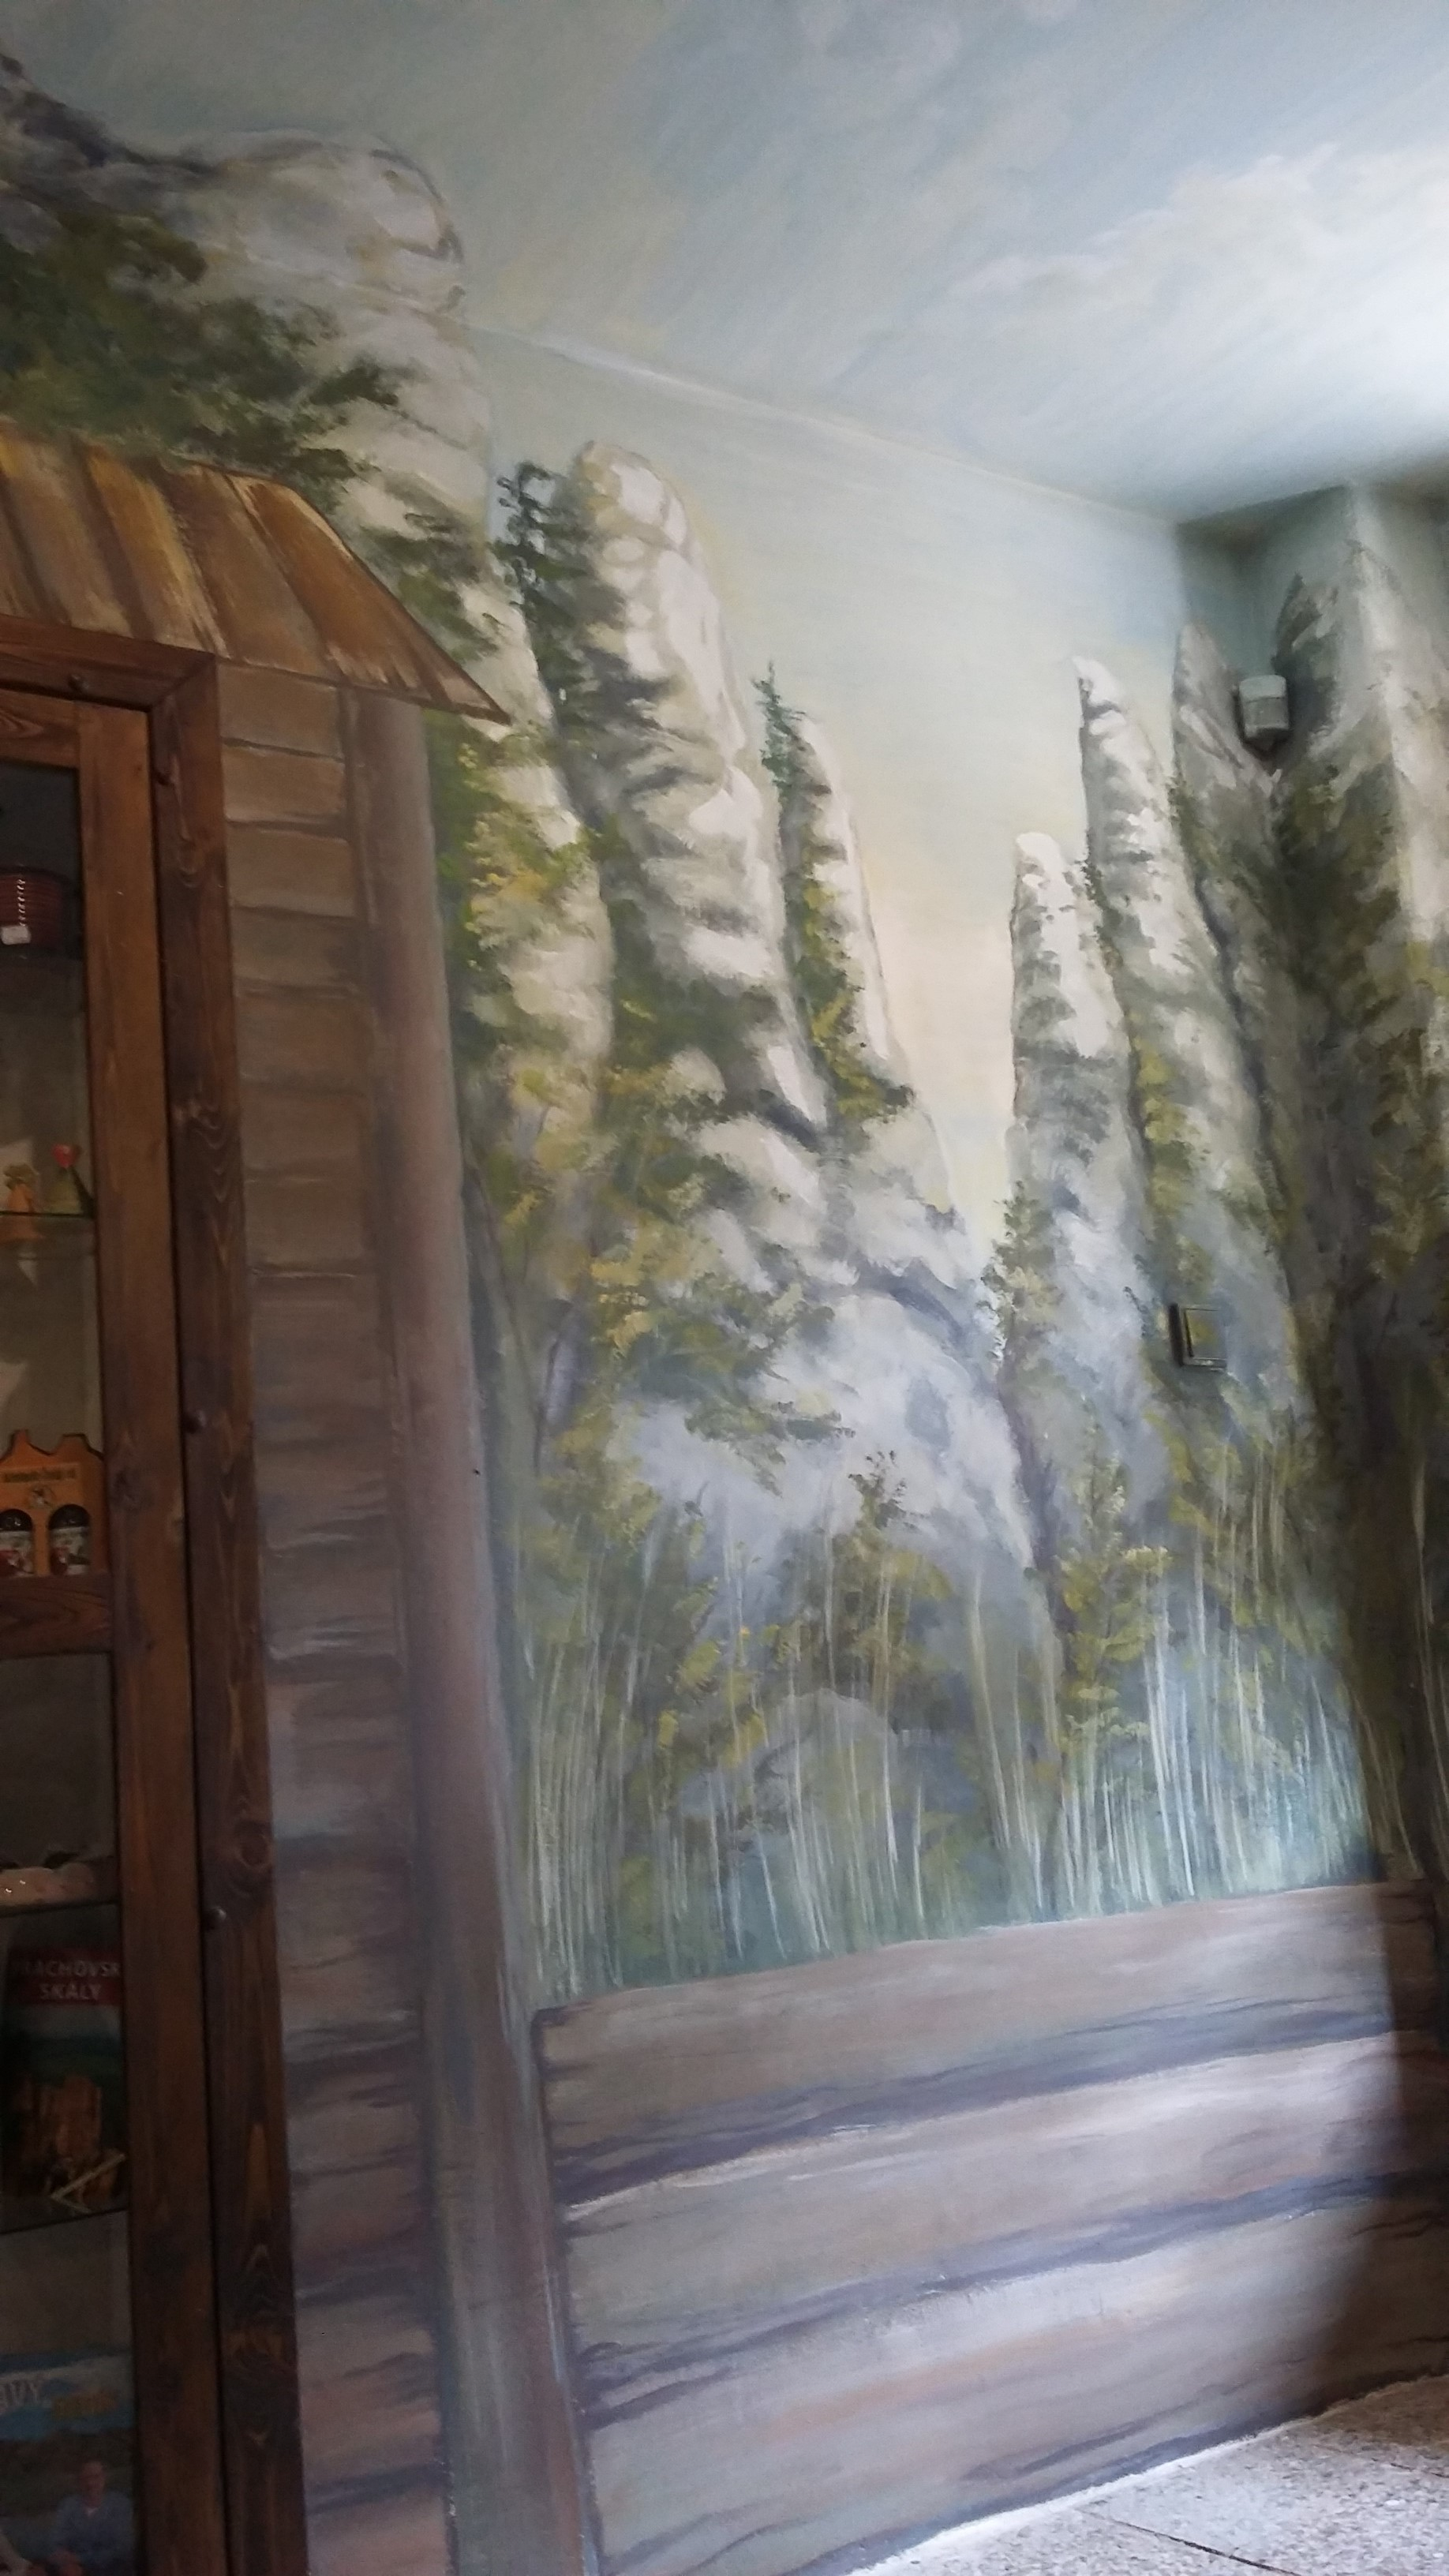 malba v ifocenrtu na Prachově-skály